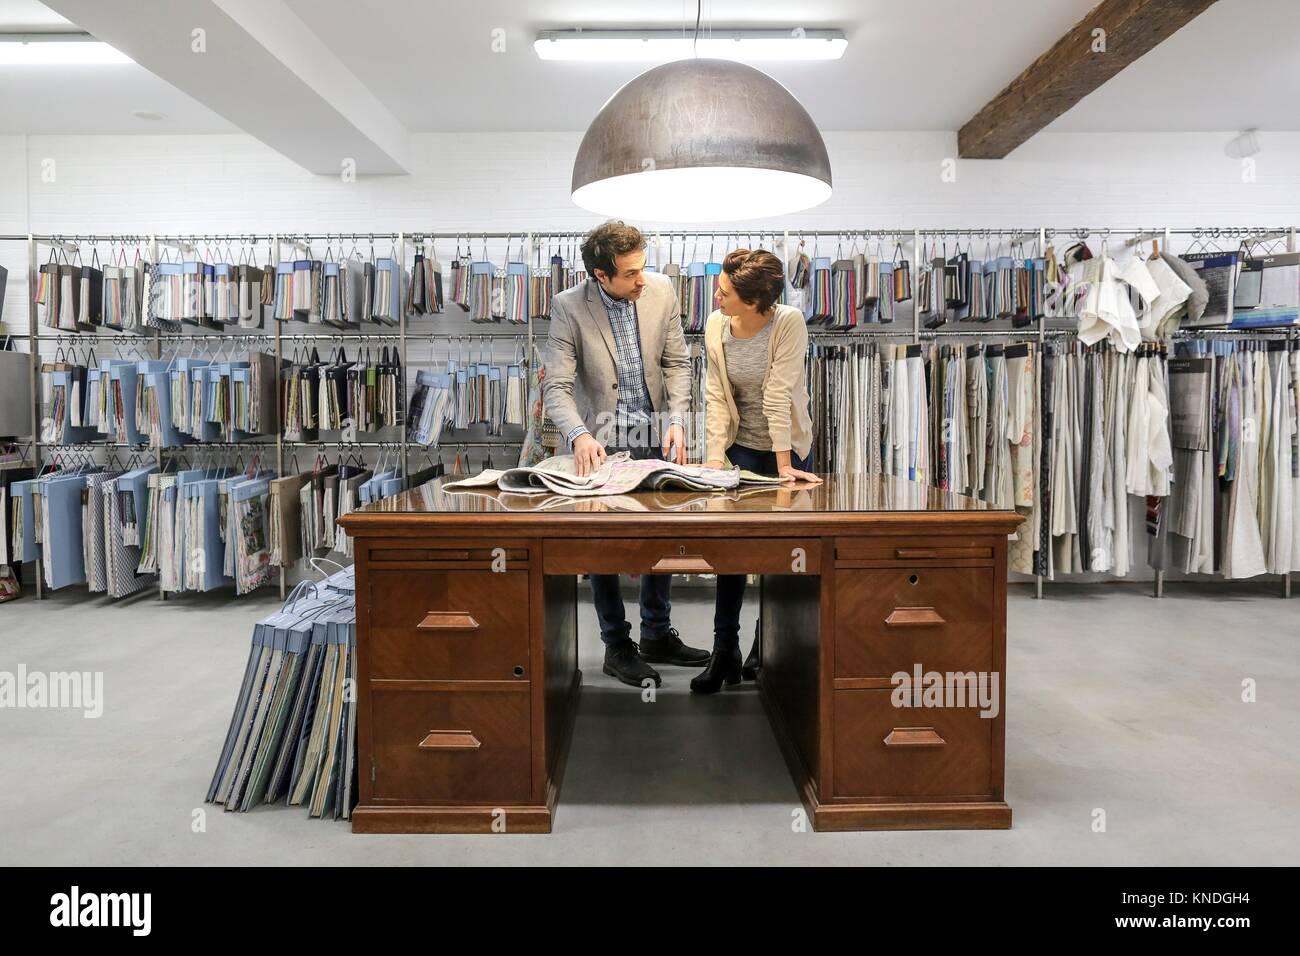 Furniture store - Stock Image